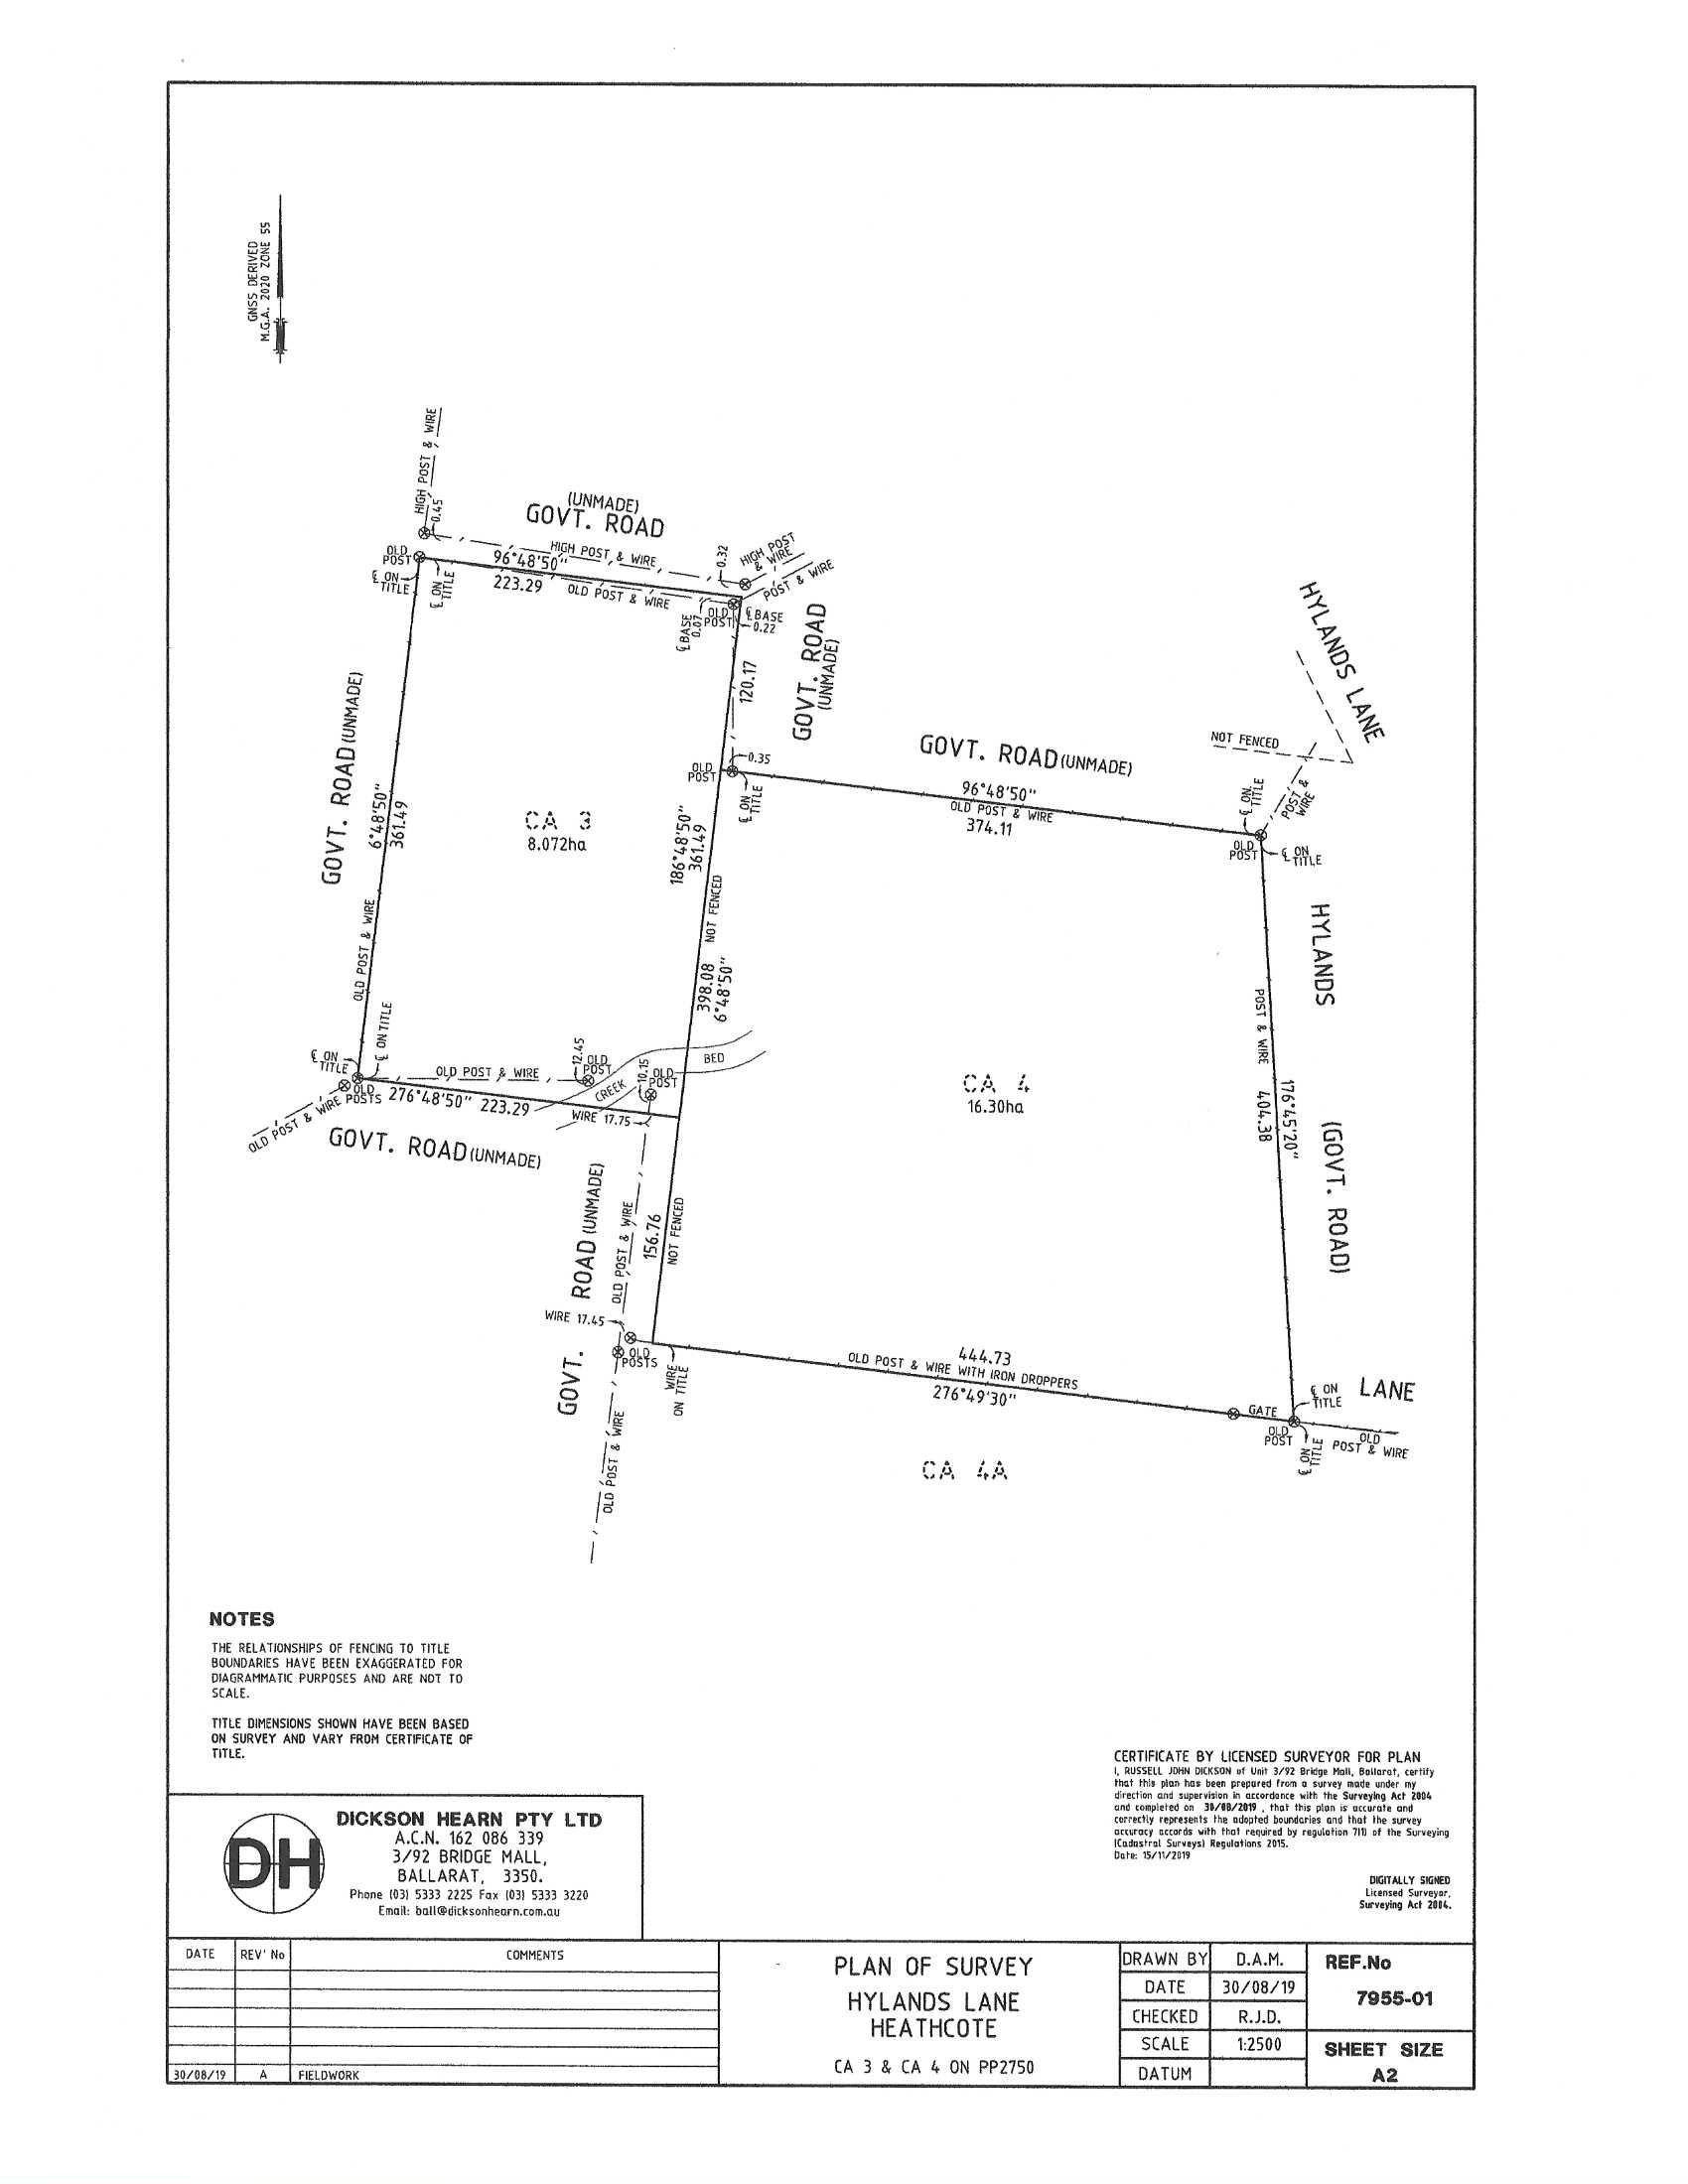 C/A 3/ Hylands Lane, Heathcote VIC 3523